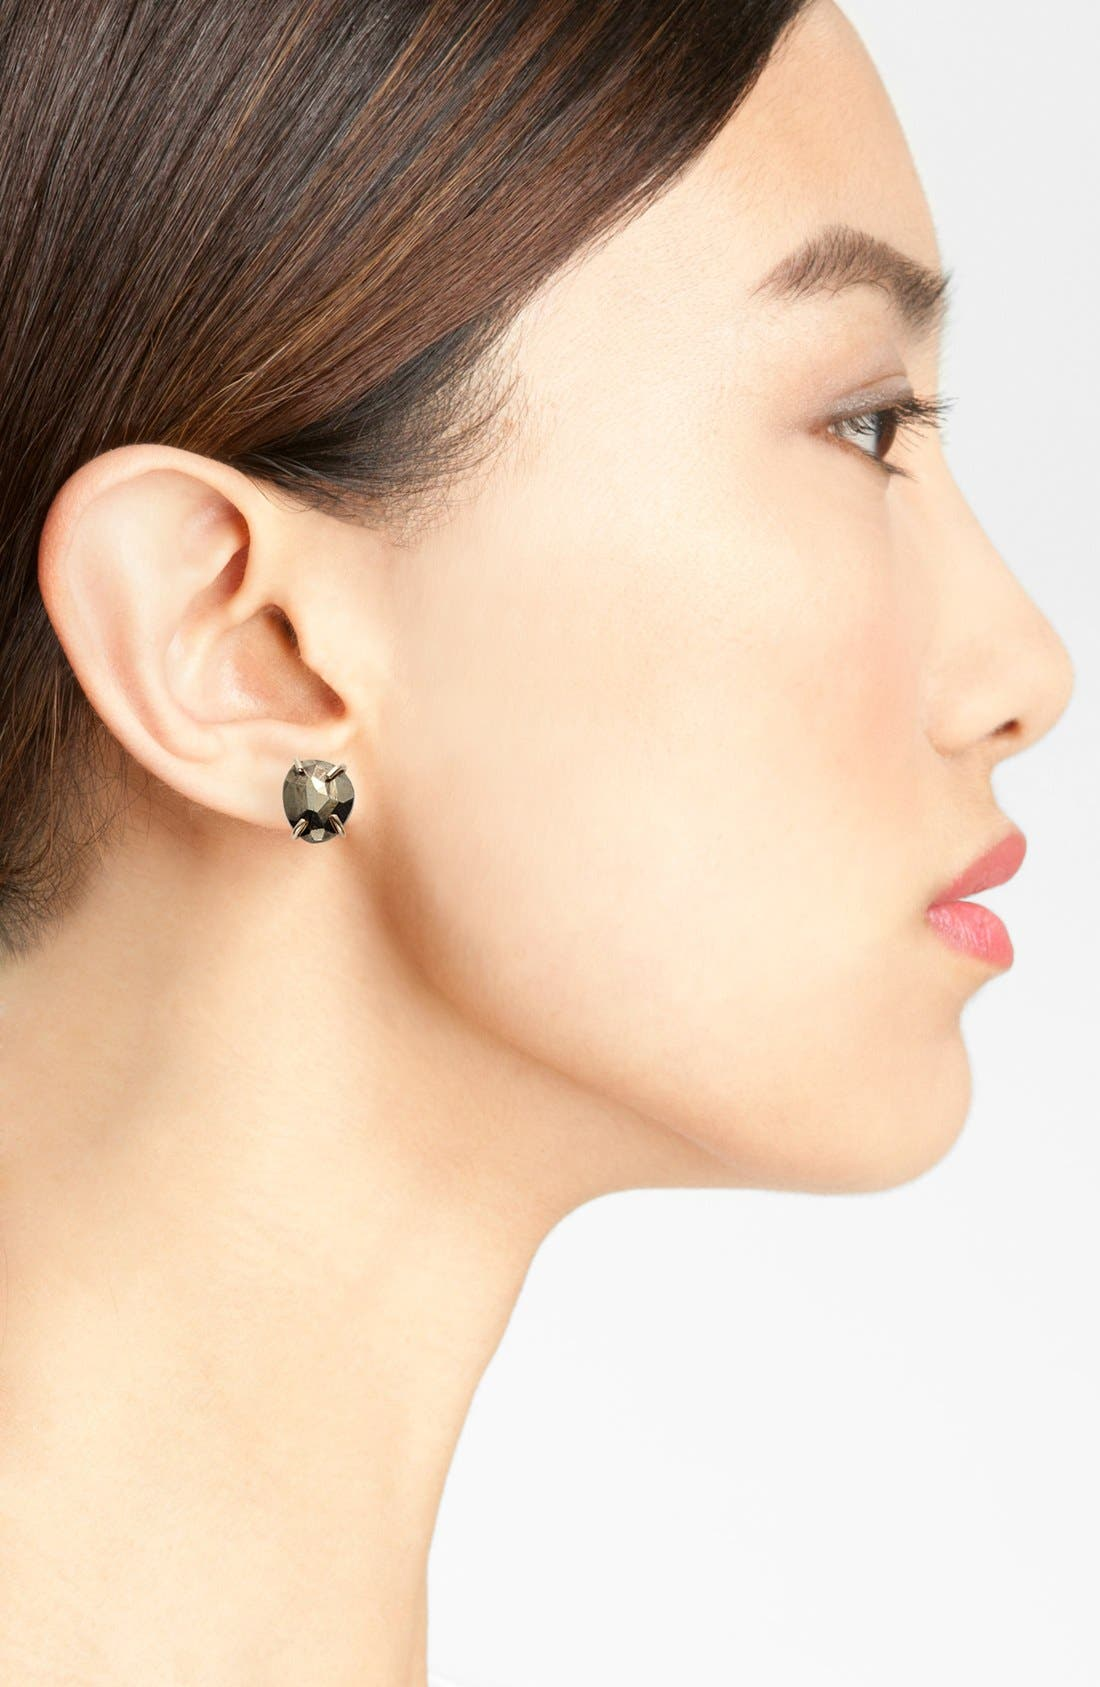 Stone Stud Earrings,                             Alternate thumbnail 2, color,                             710